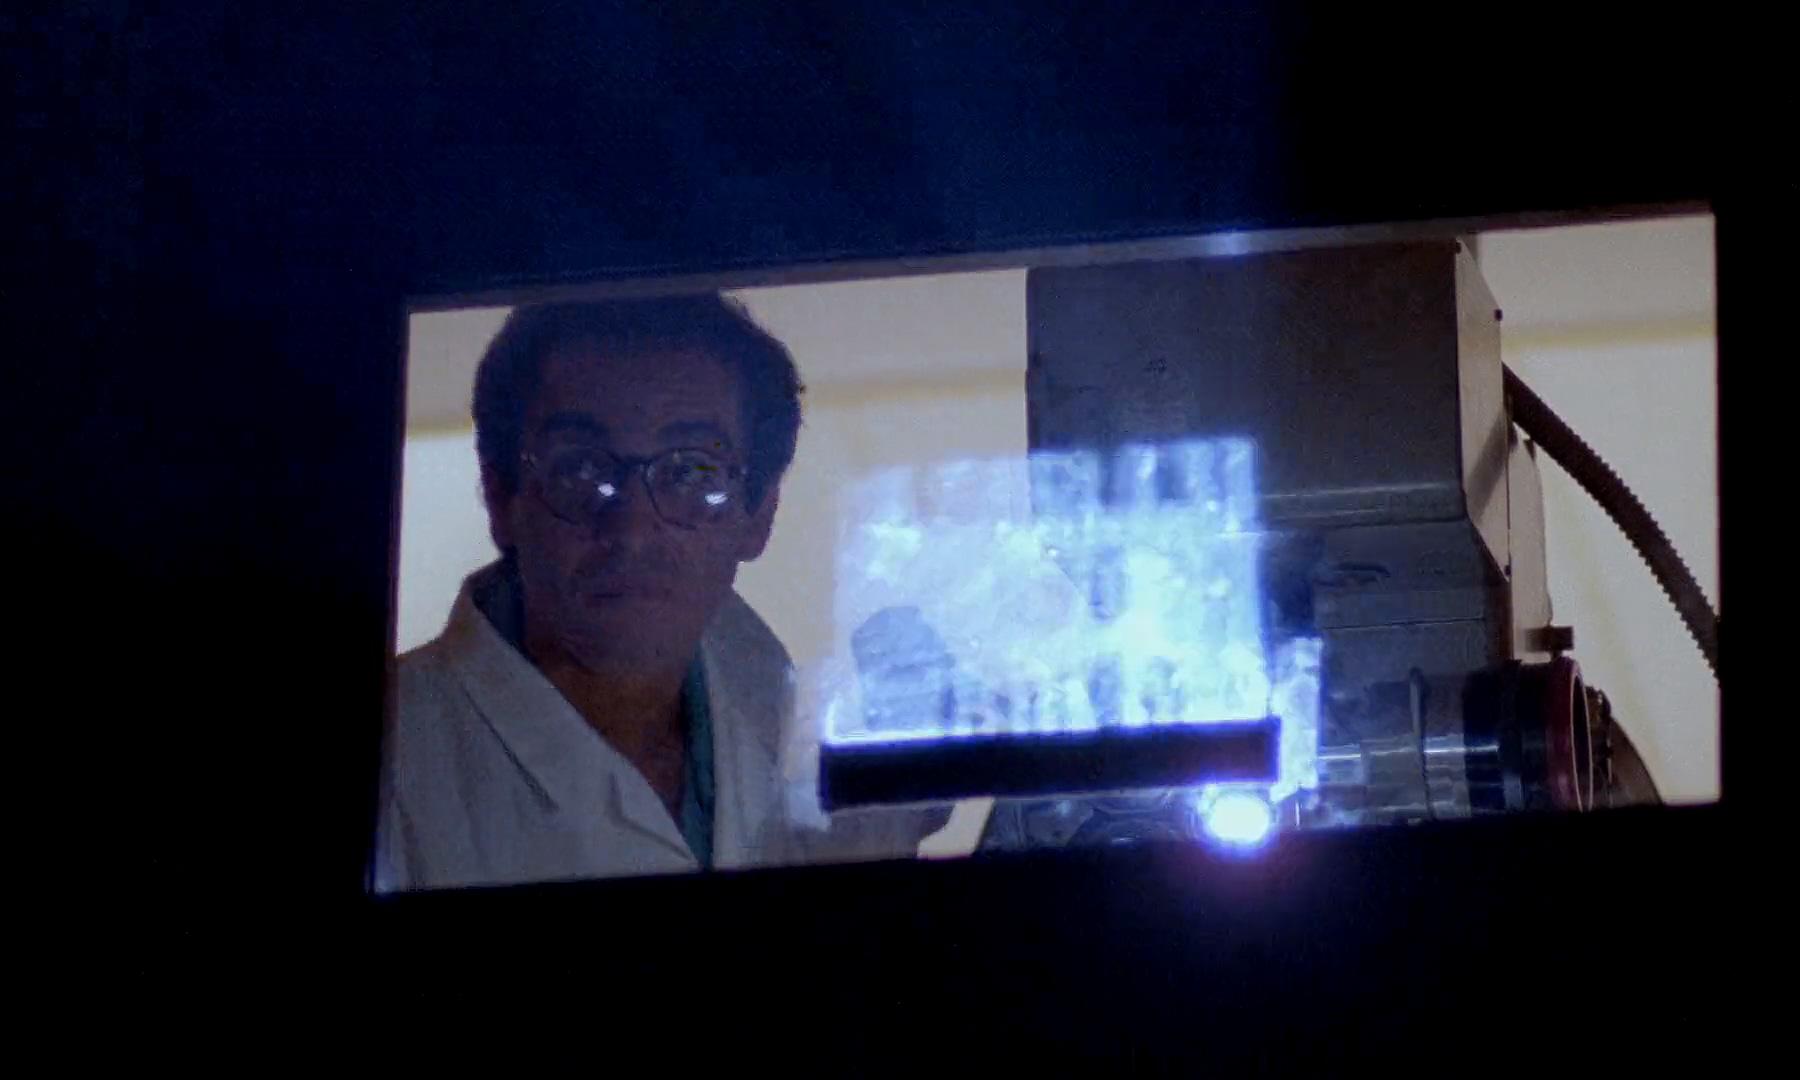 Giuseppe Tornatore in Nuovo Cinema Paradiso (1988)